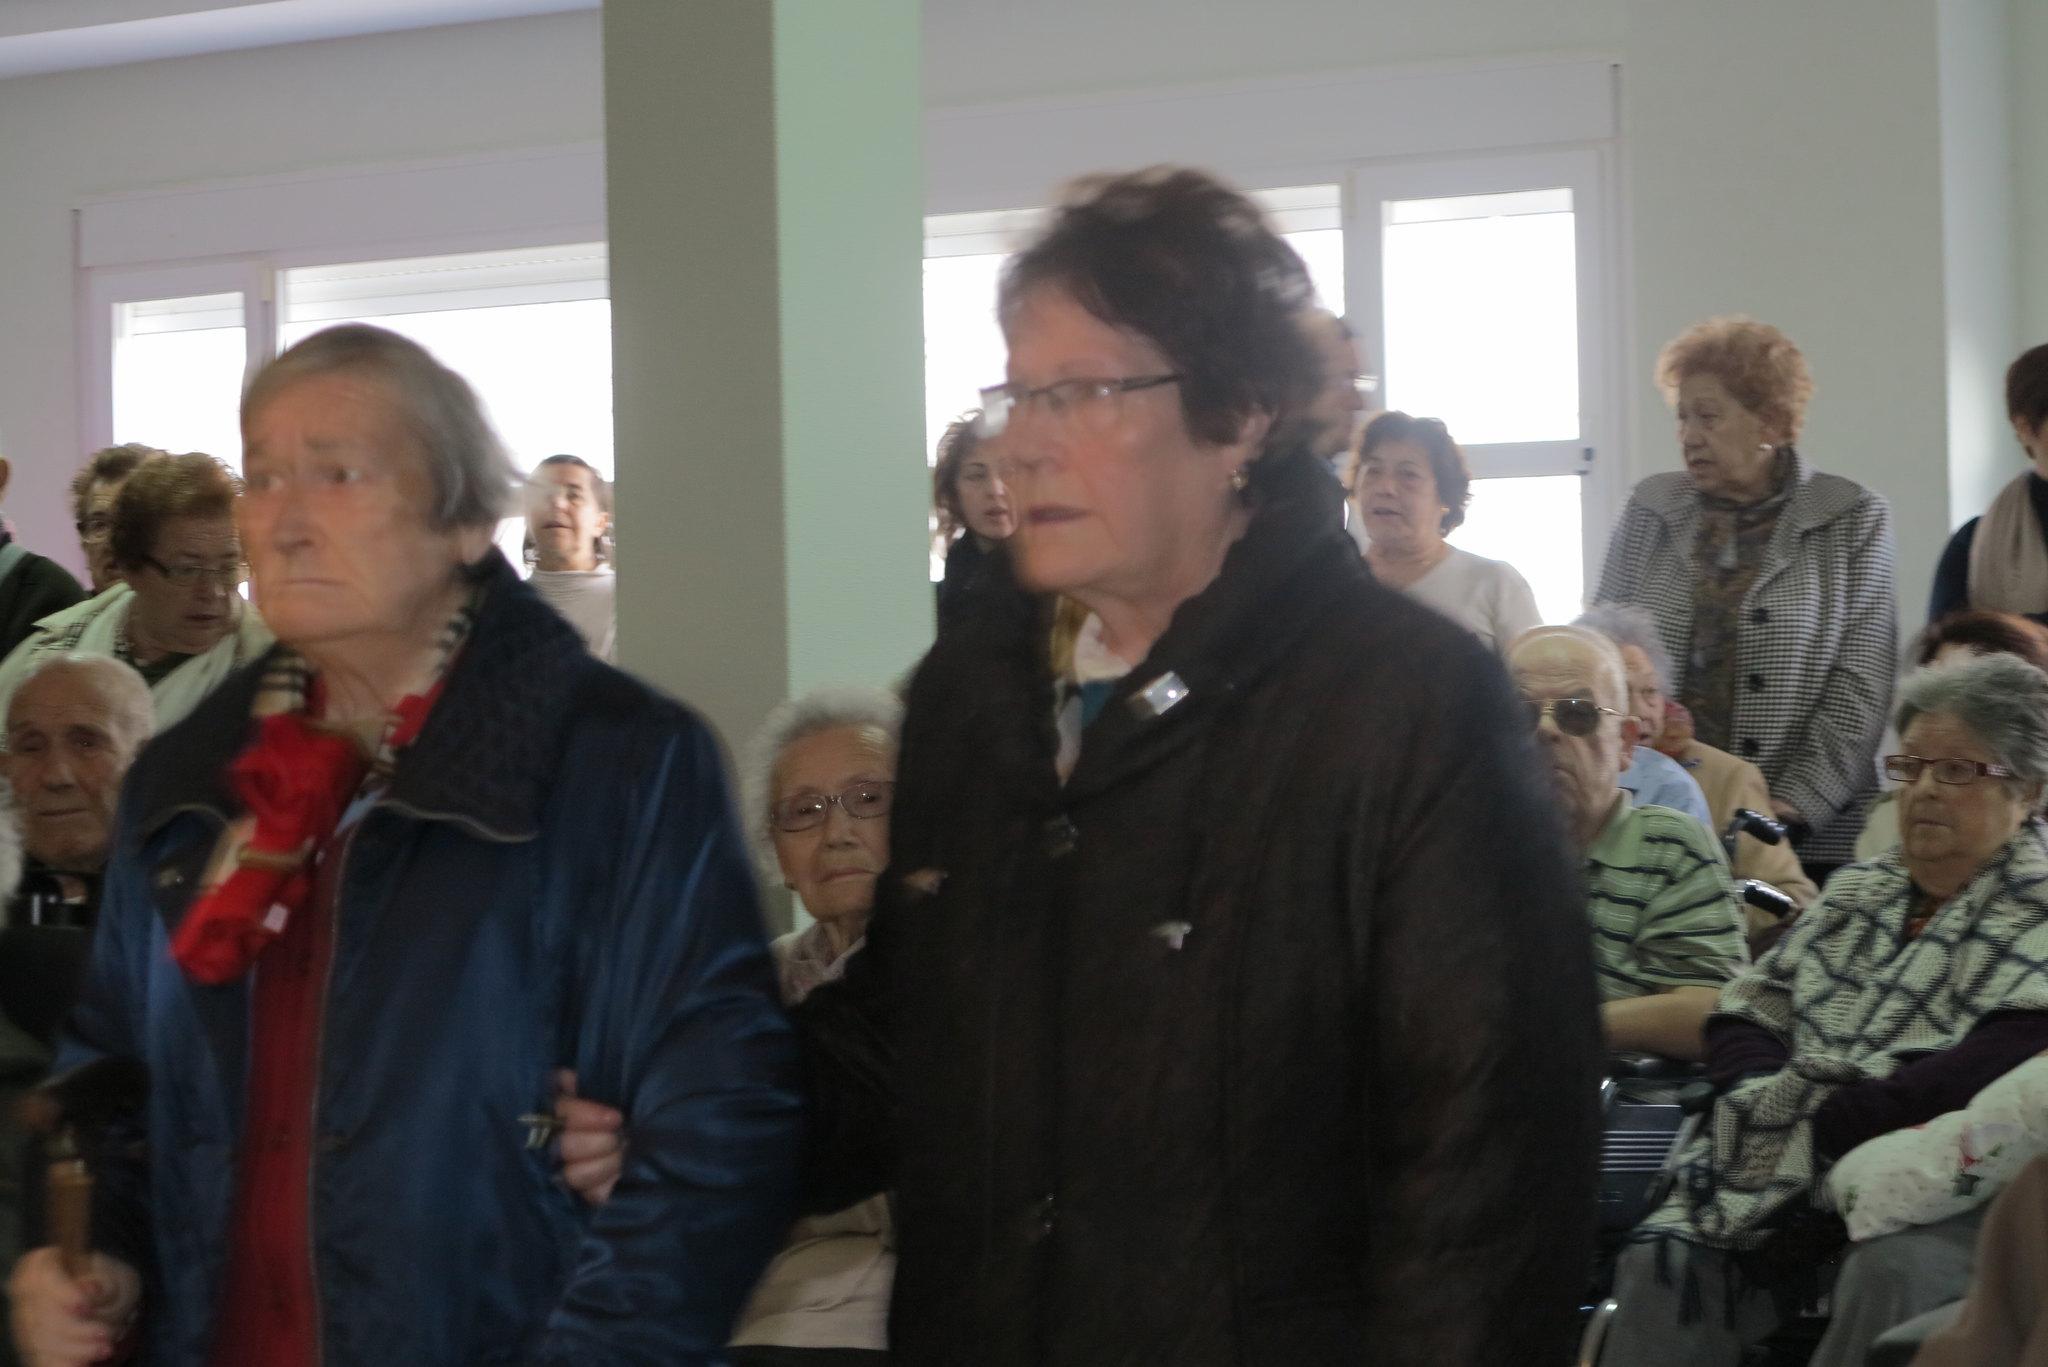 (2016-02-13) - Inauguración Virgen de Lourdes, La Molineta - Archivo La Molineta 2 (18)